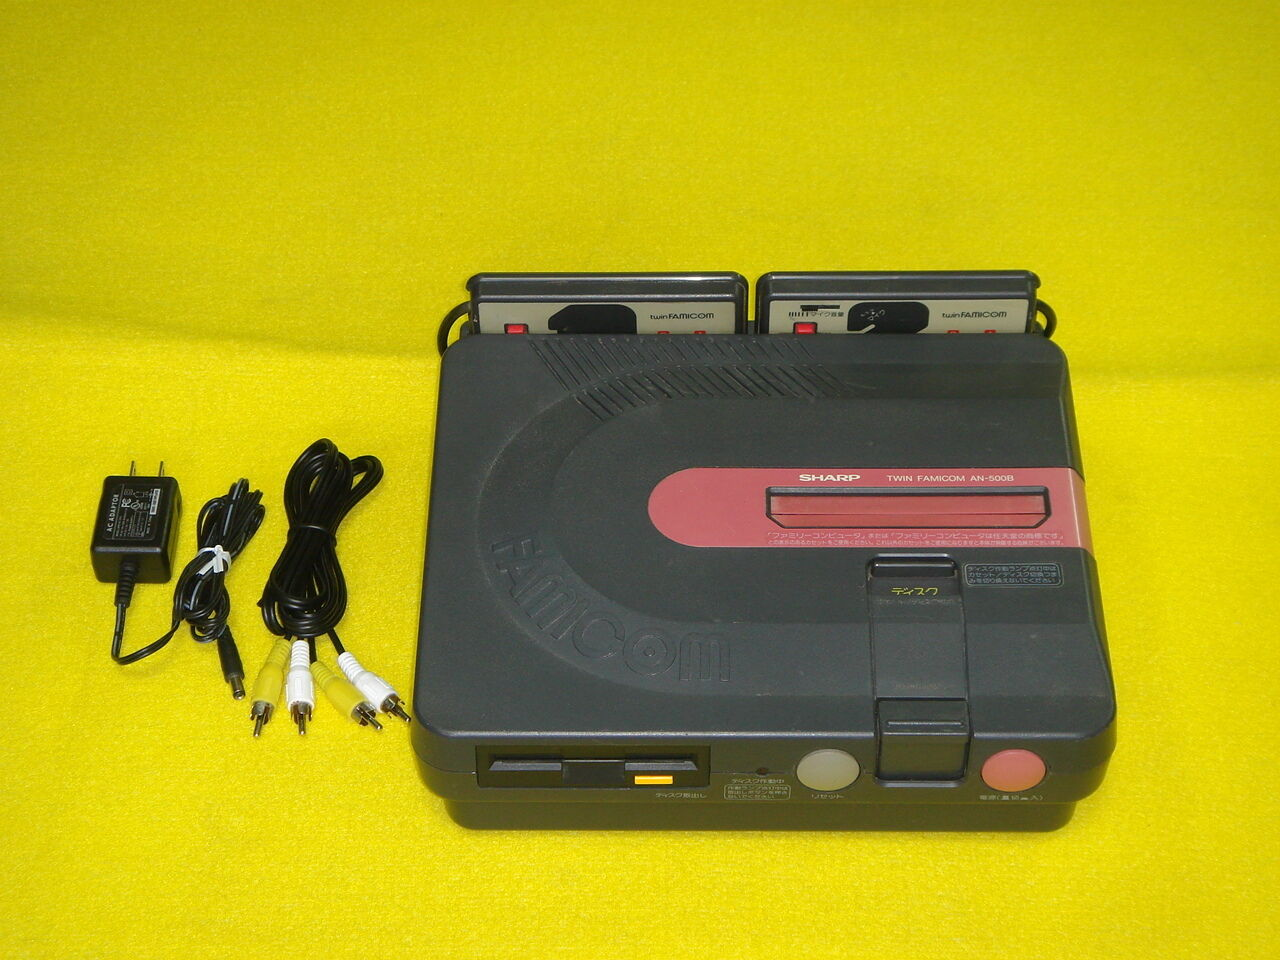 Twin Famicom Consola SHARP AN-500B Japón funcionando plenamente con adaptador para 100V-240V